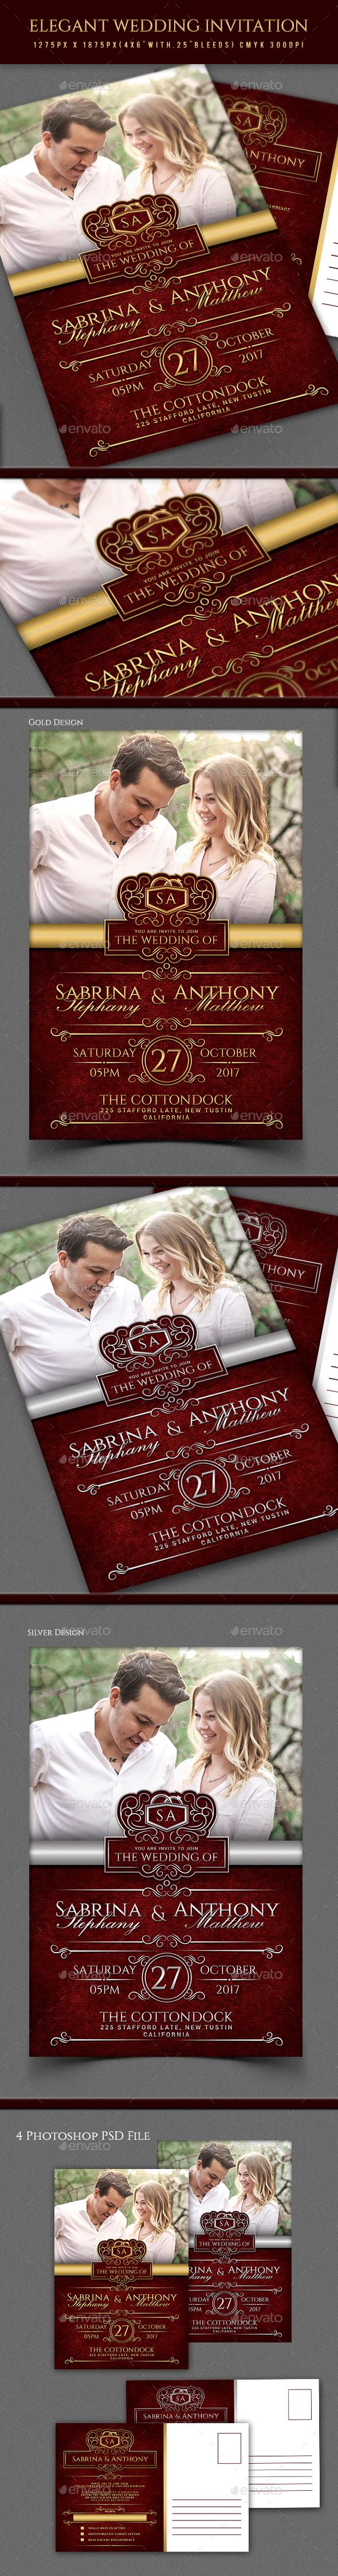 Wedding Invitation Elegant Graphics, Designs & Templates